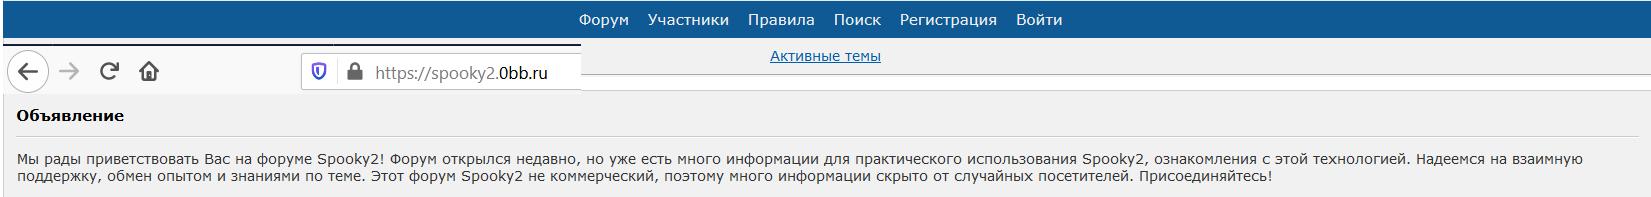 https://i2.imageban.ru/out/2020/08/05/ce4cfda1dd6a0a101d247510d4946345.png